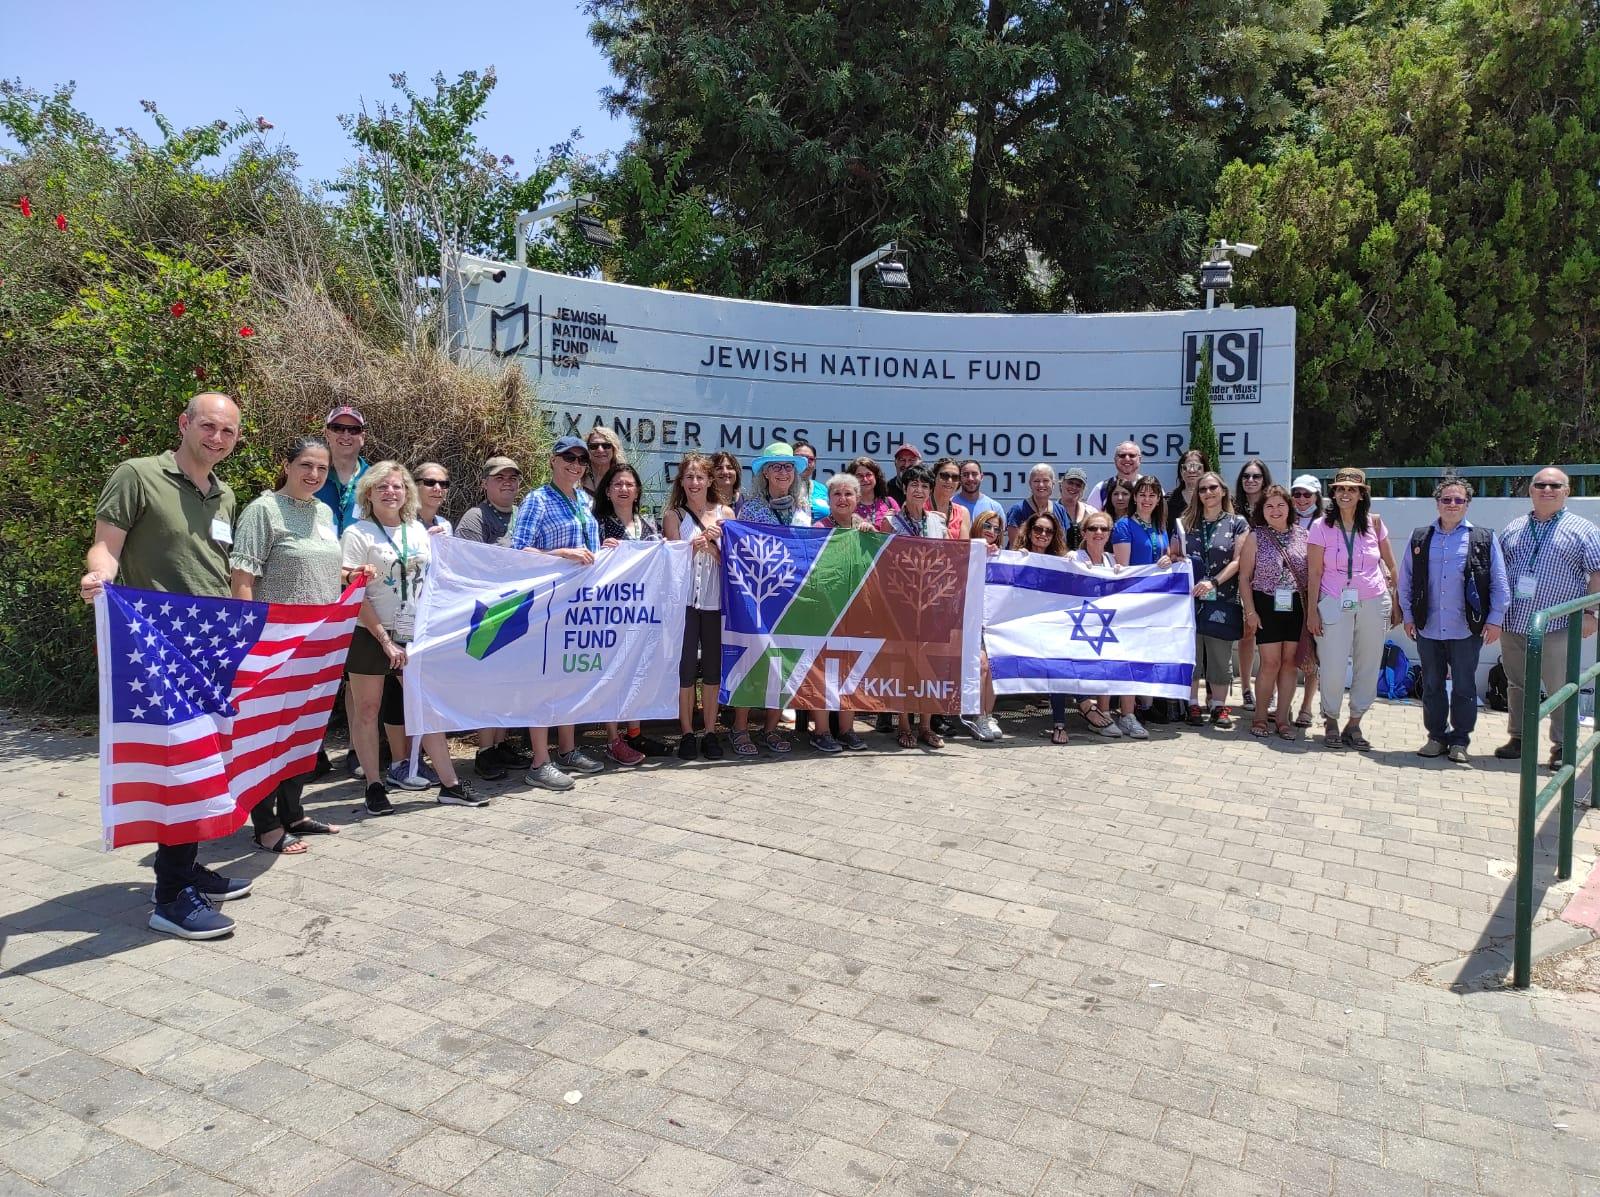 Educators Mission participants visit JNF-USA's High School in Israel (Courtesy JNF-USA)